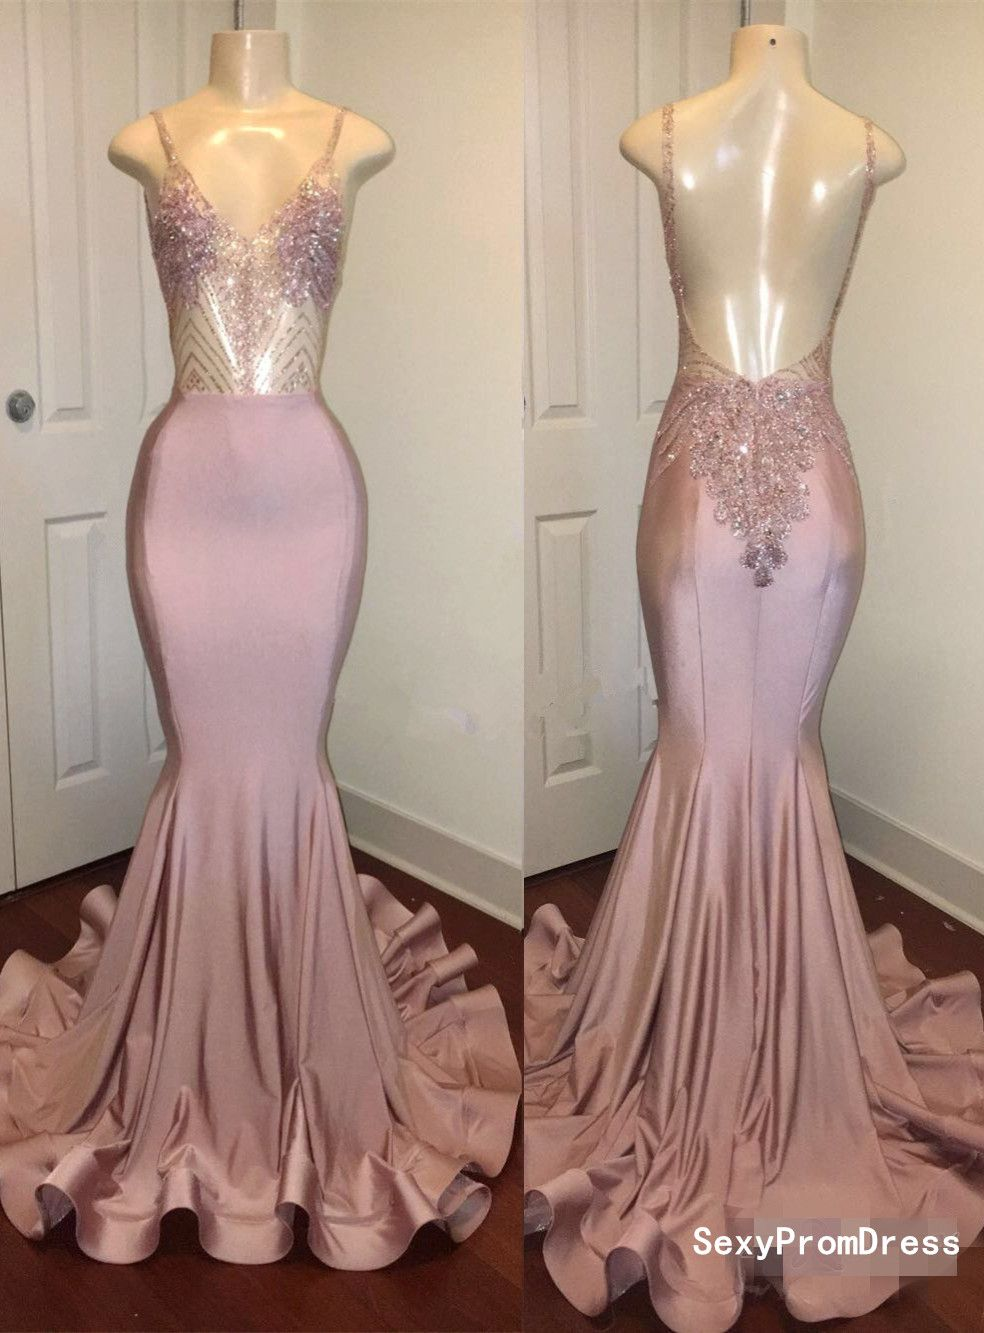 Newest pink beads spaghetti strap prom dressmermaid prom dresshigh